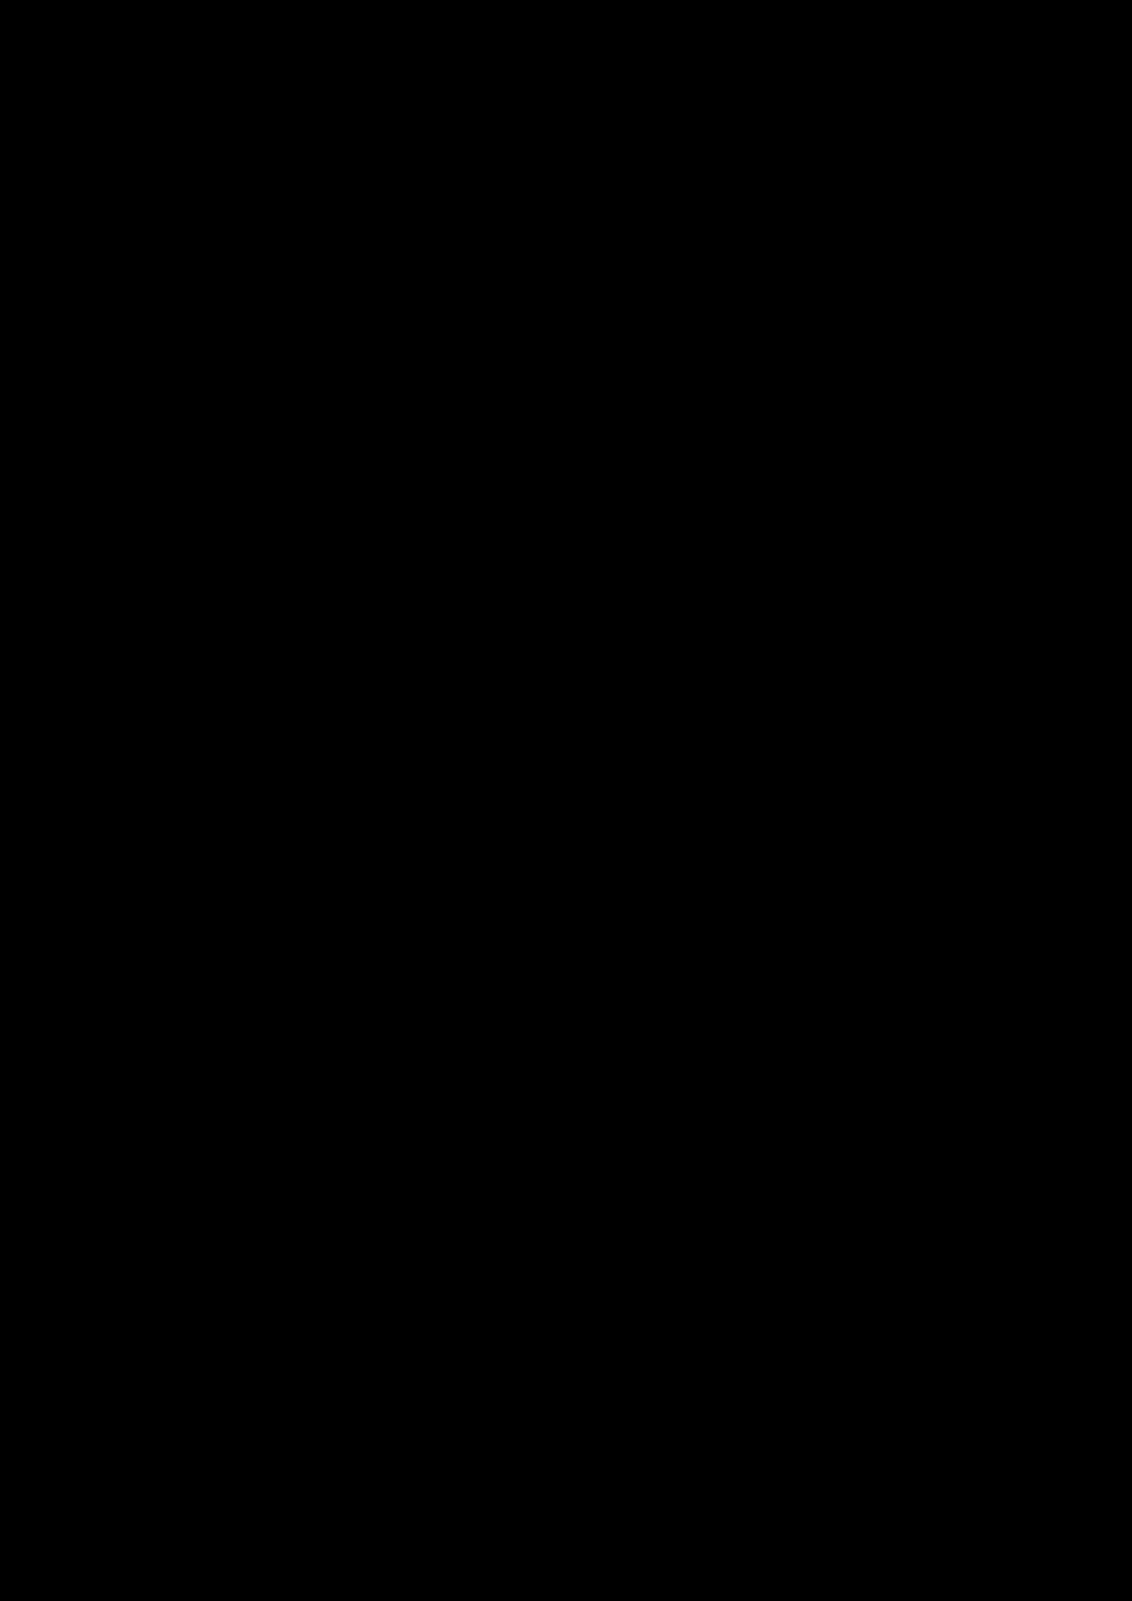 Mrs. Vandebilt slide, Image 29